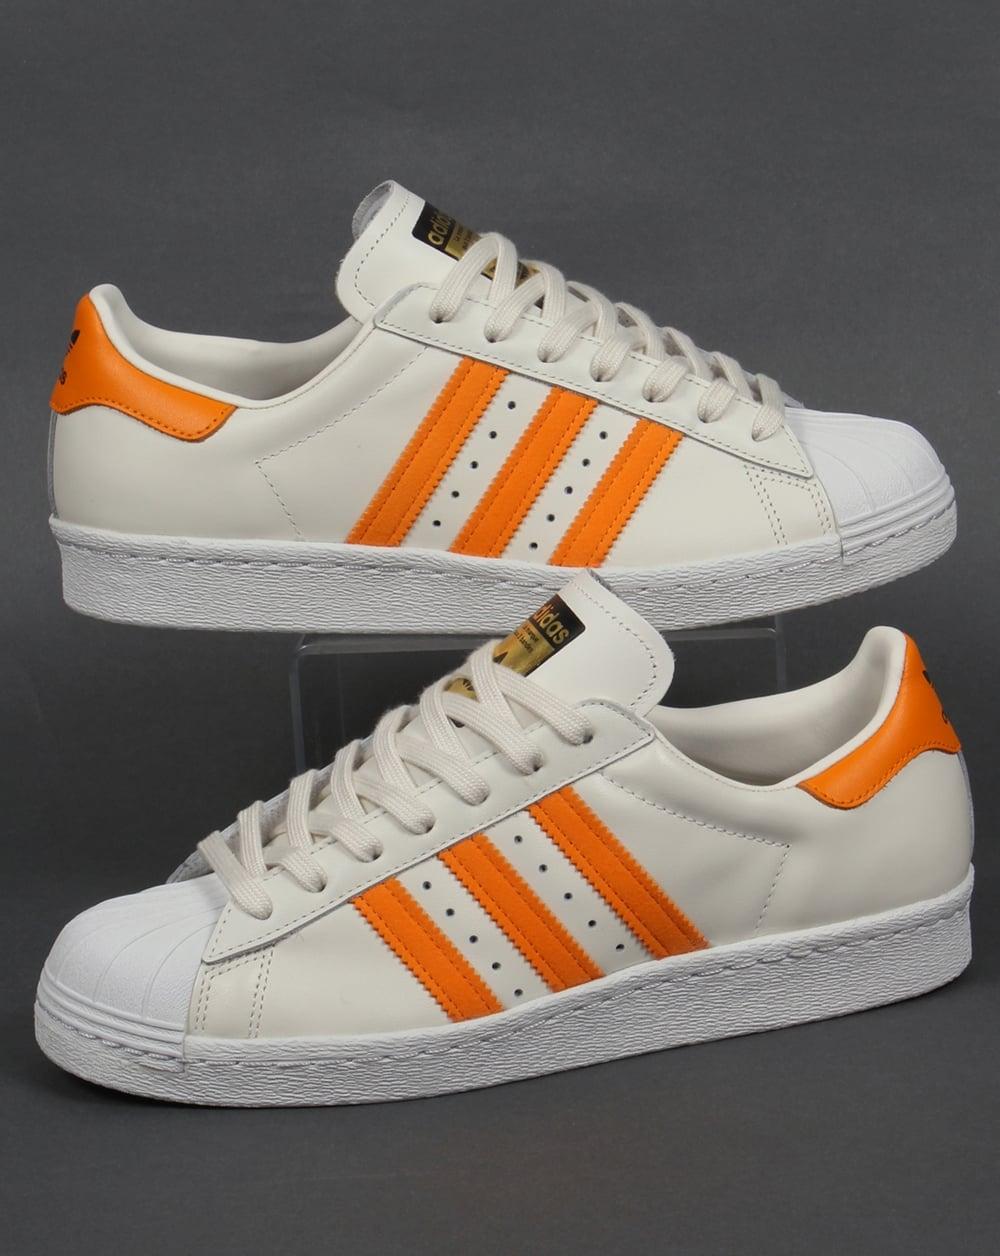 adidas superstar 80s trainers off white orange originals. Black Bedroom Furniture Sets. Home Design Ideas